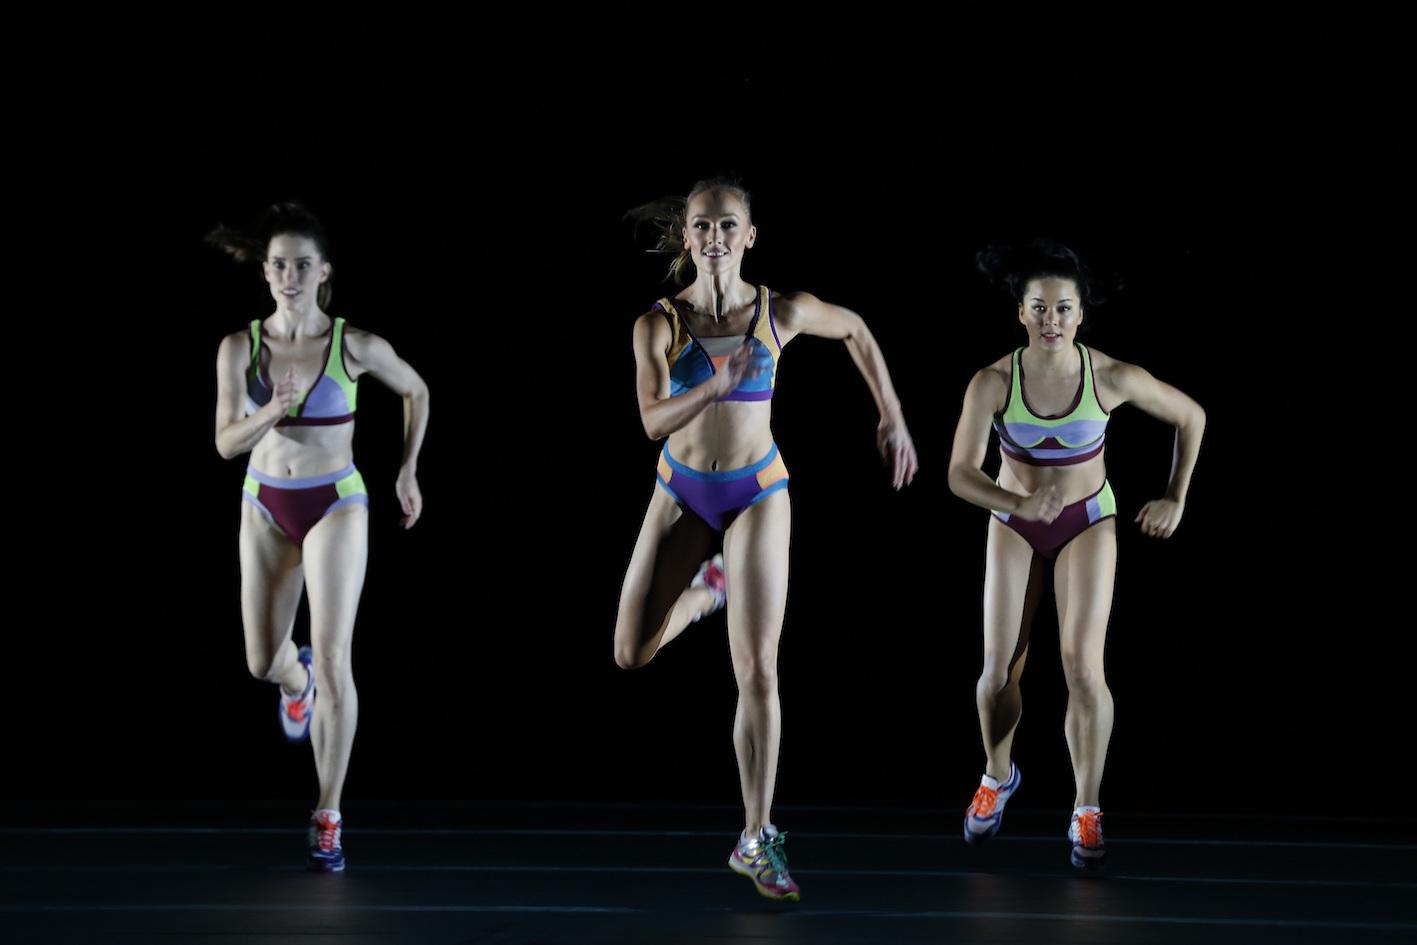 FASTER, The Australian Ballet, Dana Stephensen, Brooke Lockett, Jill Ogaisimonparrismaninchair